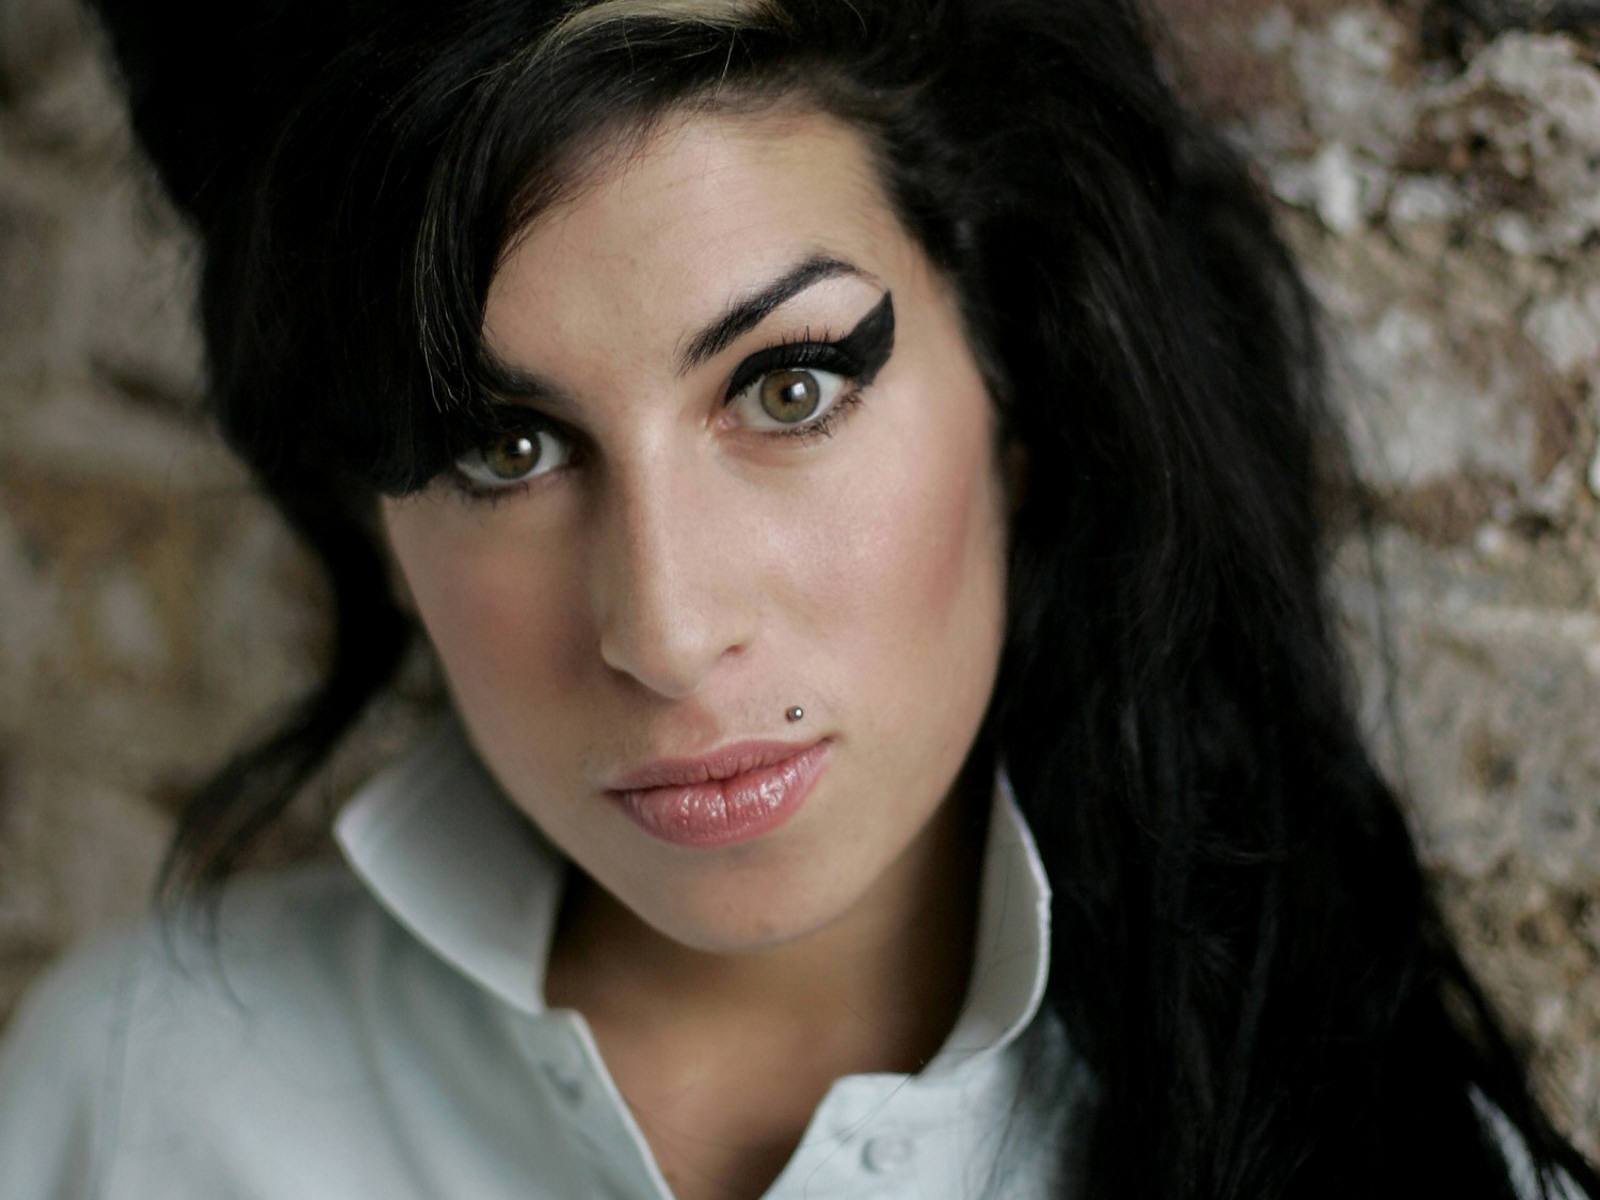 http://1.bp.blogspot.com/-EPhCyKpPjTk/TsrbJWJ1cRI/AAAAAAAABm8/vGmKKY6B5-w/s1600/Amy_Winehouse_0001_1600X1200_Wallpaper.jpg